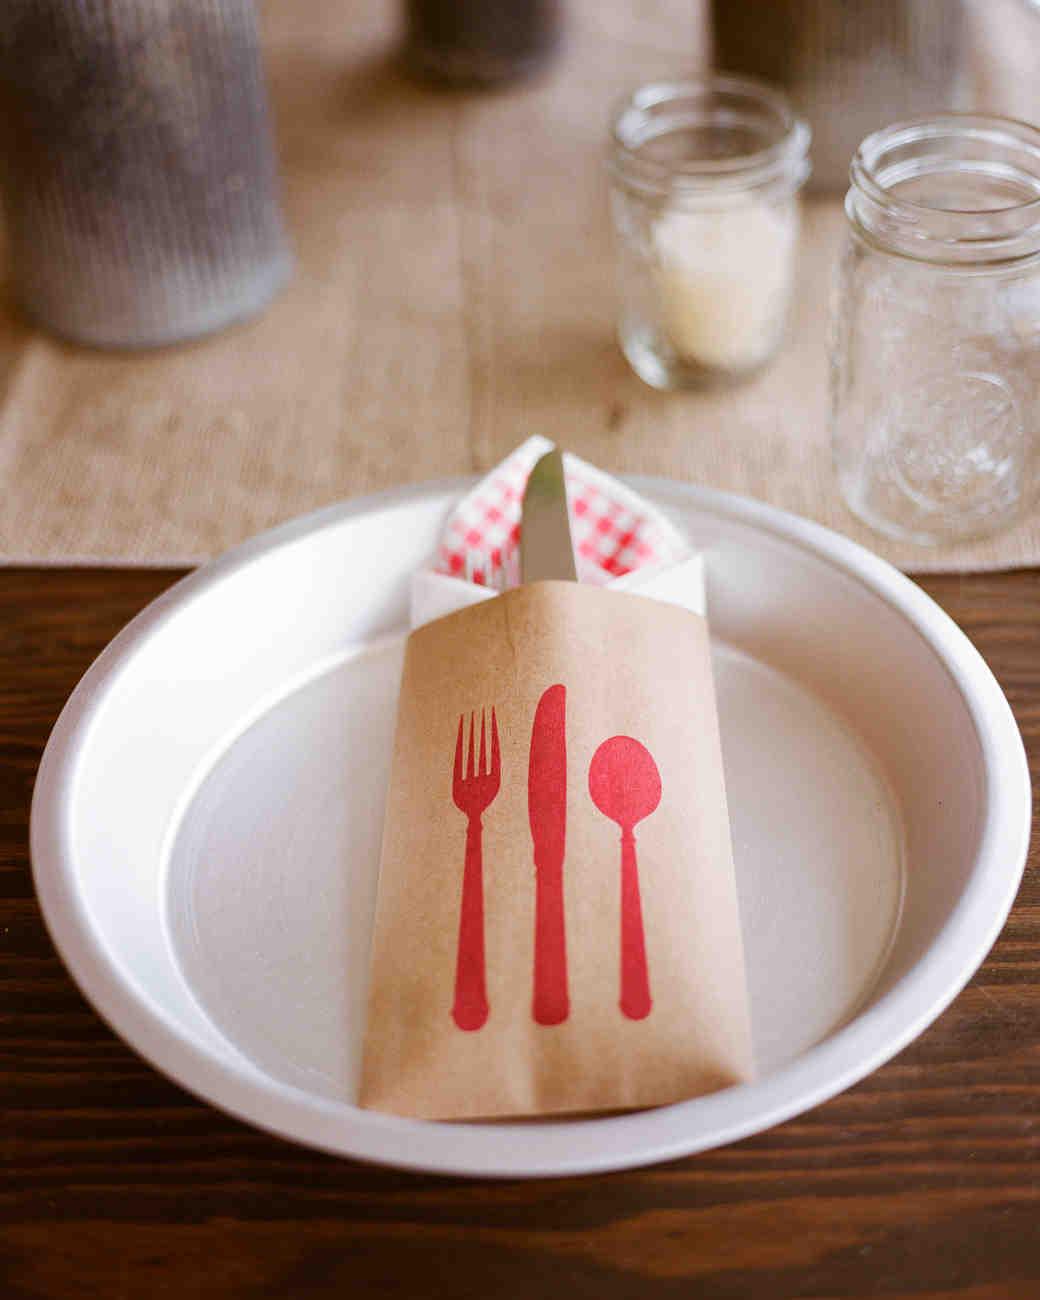 stephanie-charles-reh-dinner-rw1013-0018.jpg